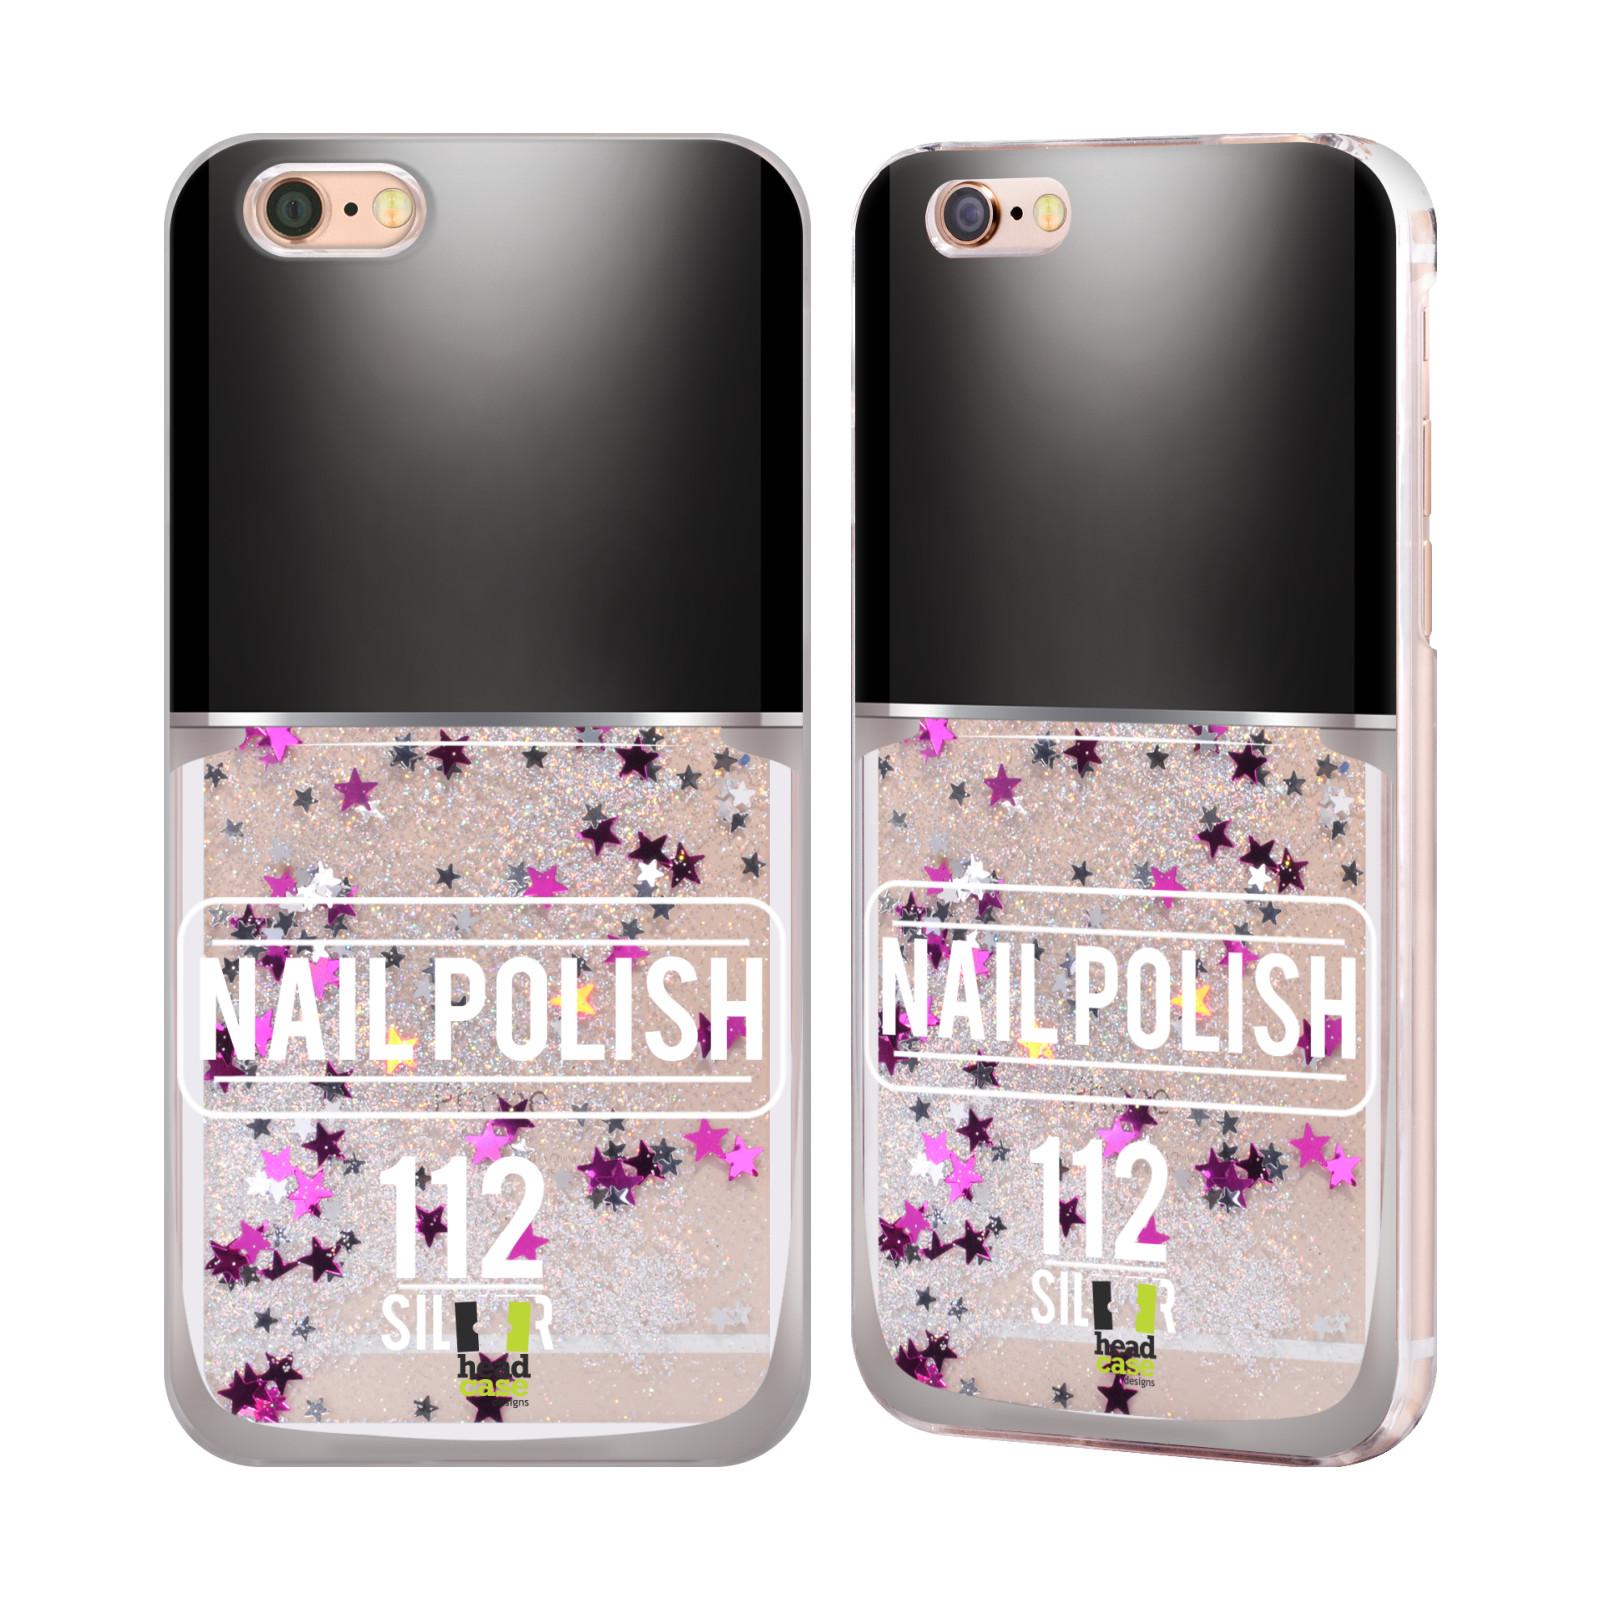 Marble Nail Polish Phone Case: HEAD CASE NAIL POLISH SILVER LIQUID GLITTER CASE FOR APPLE